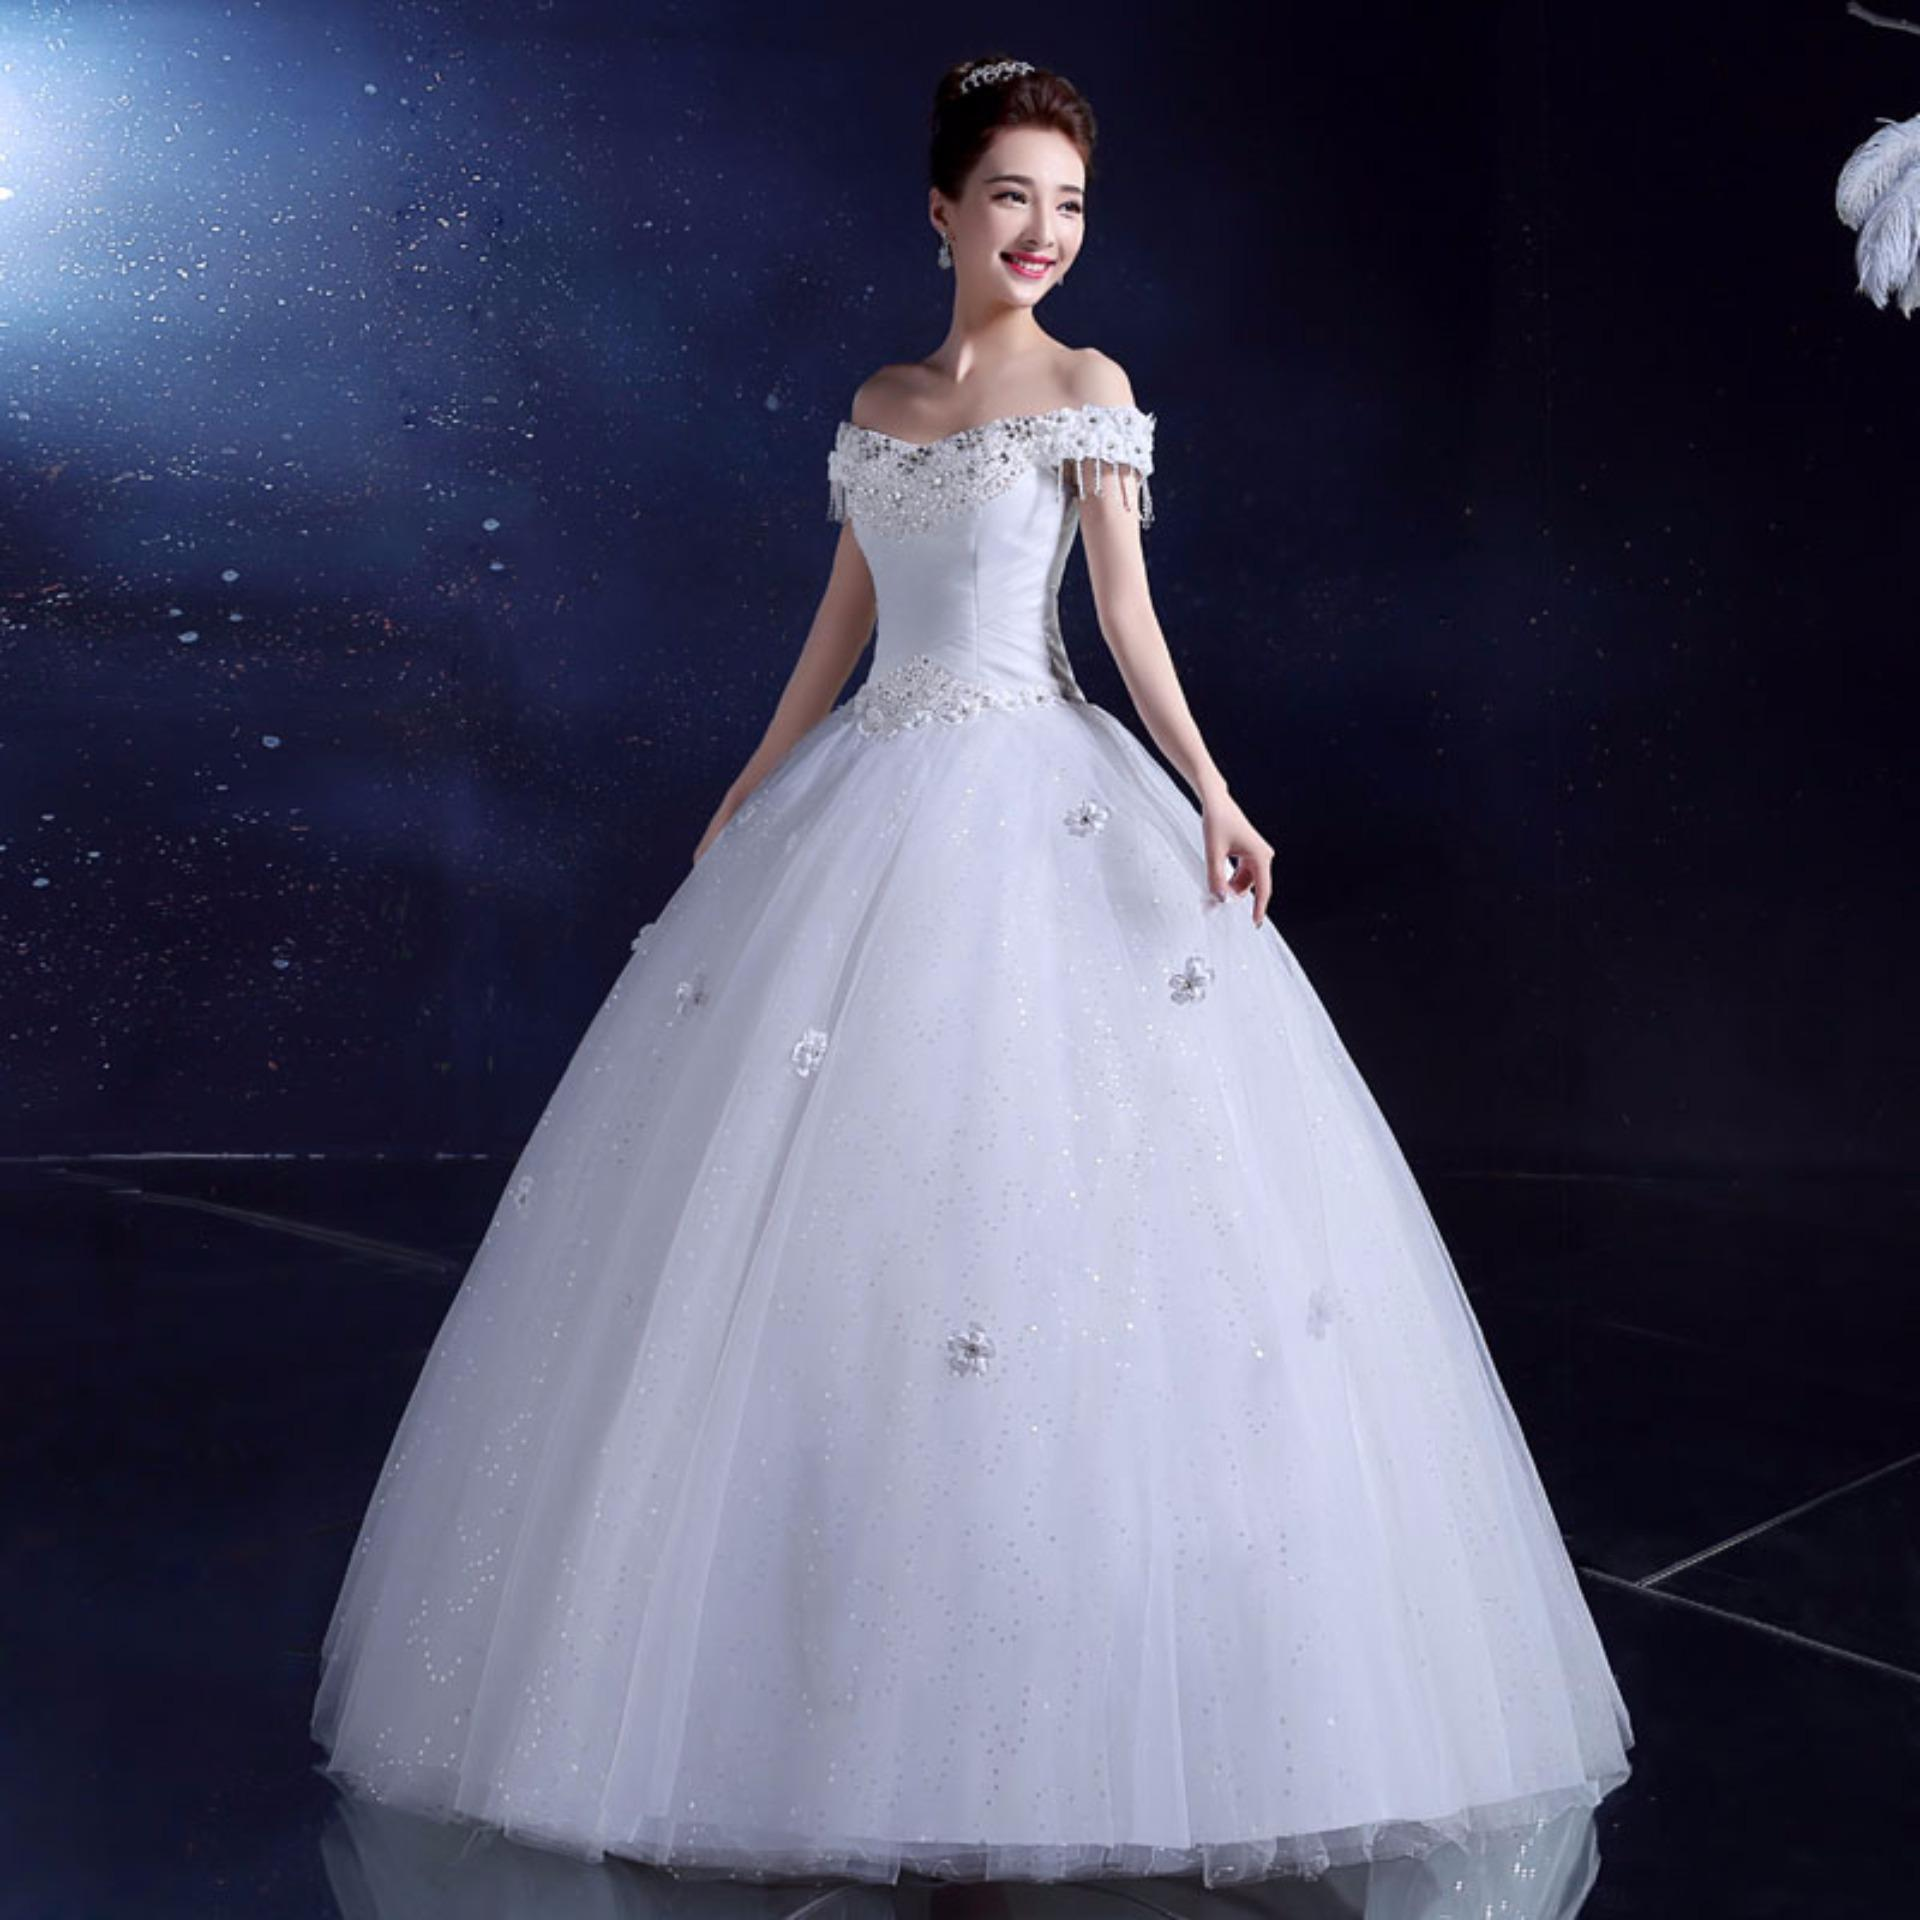 Philippines | Slim Waist Ivory Ball Gown Bridal Dress Leondo Wedding ...